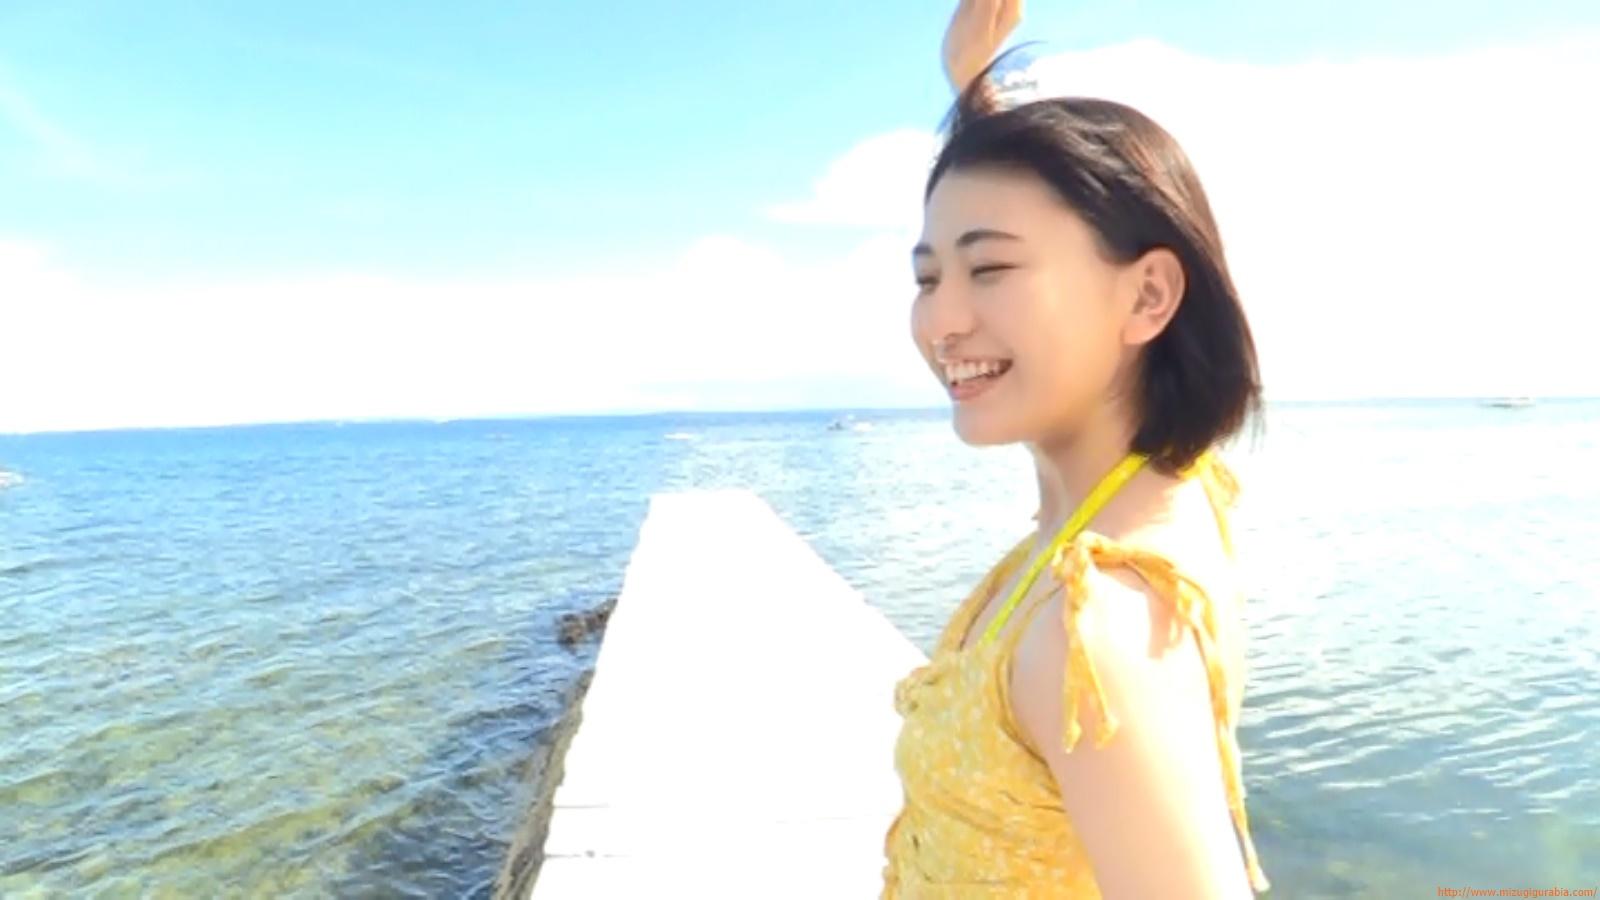 Beach dating019